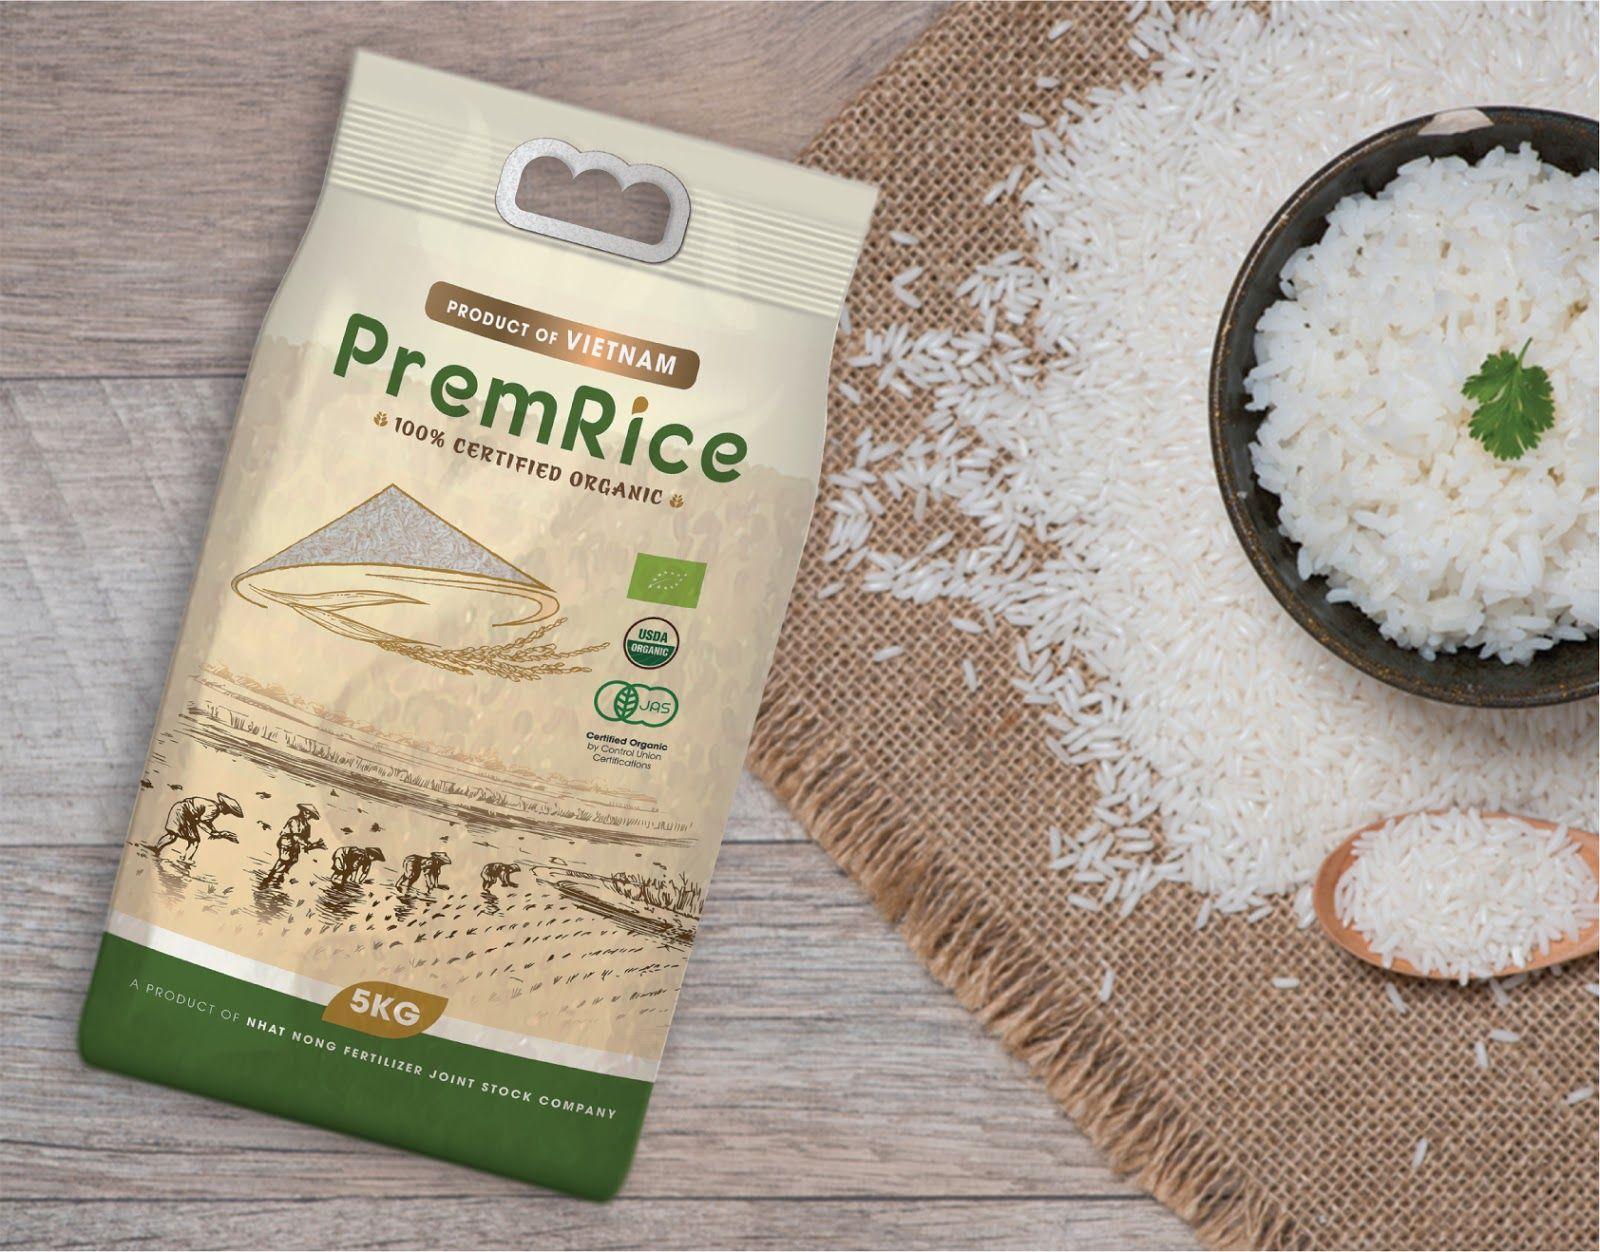 Download Premrice Organic Rice Rice Packaging Organic Rice Food Packaging Design